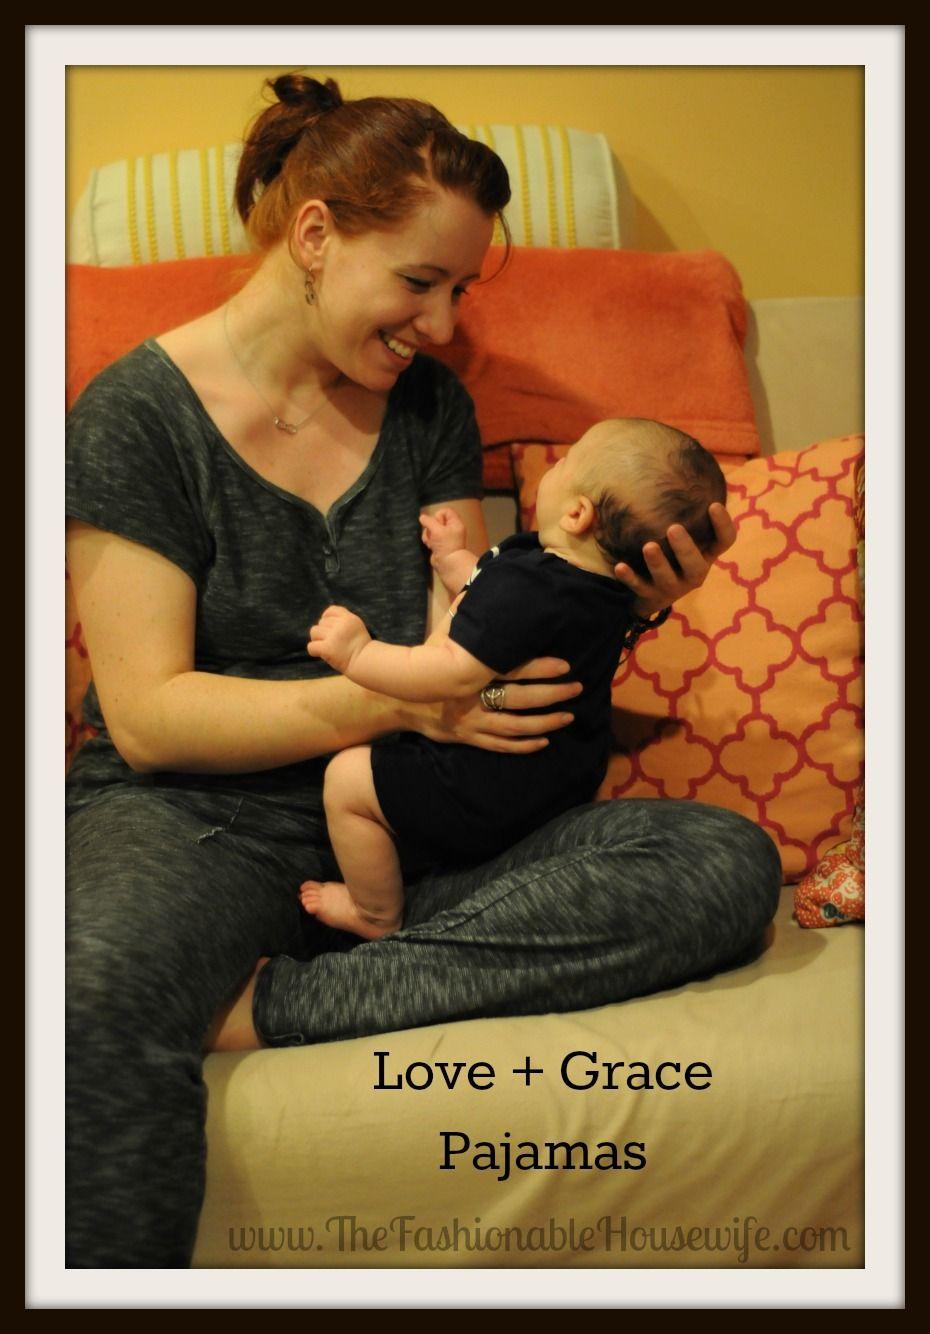 Love grace ud fashionable comfortable pajamas lovegrace